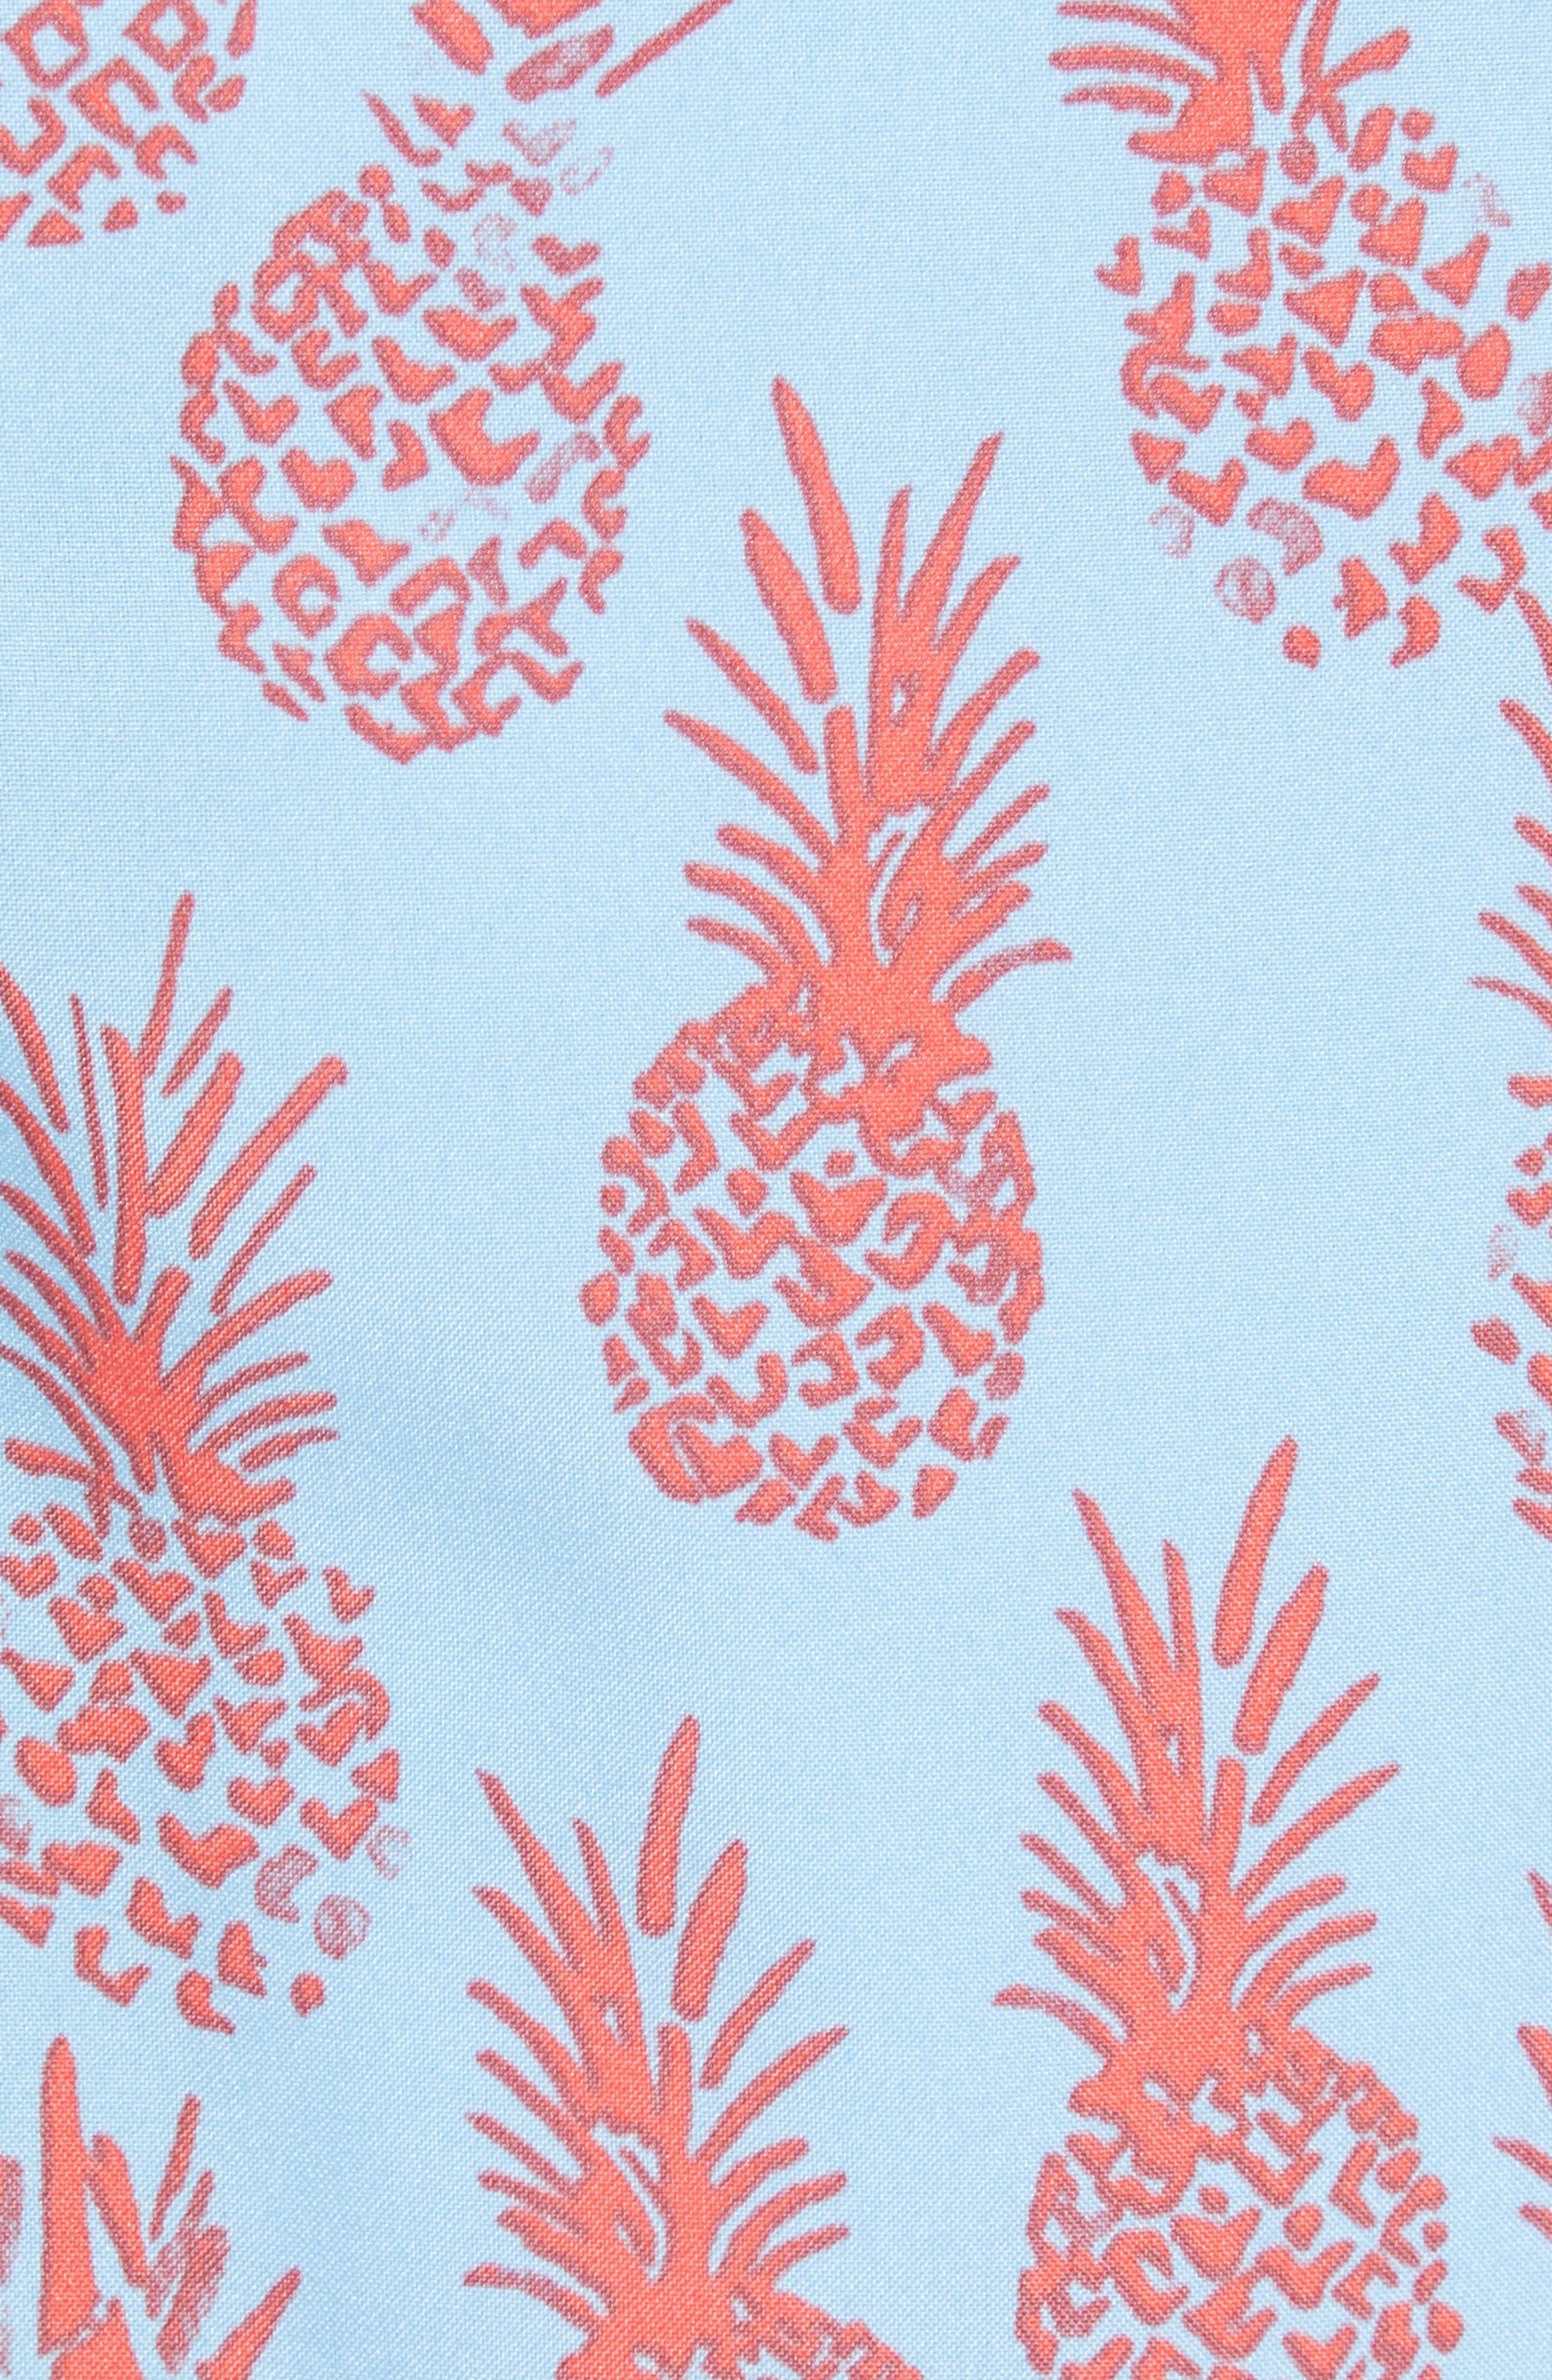 Banzai 7-Inch Swim Trunks,                             Alternate thumbnail 5, color,                             Pineapple Stamp